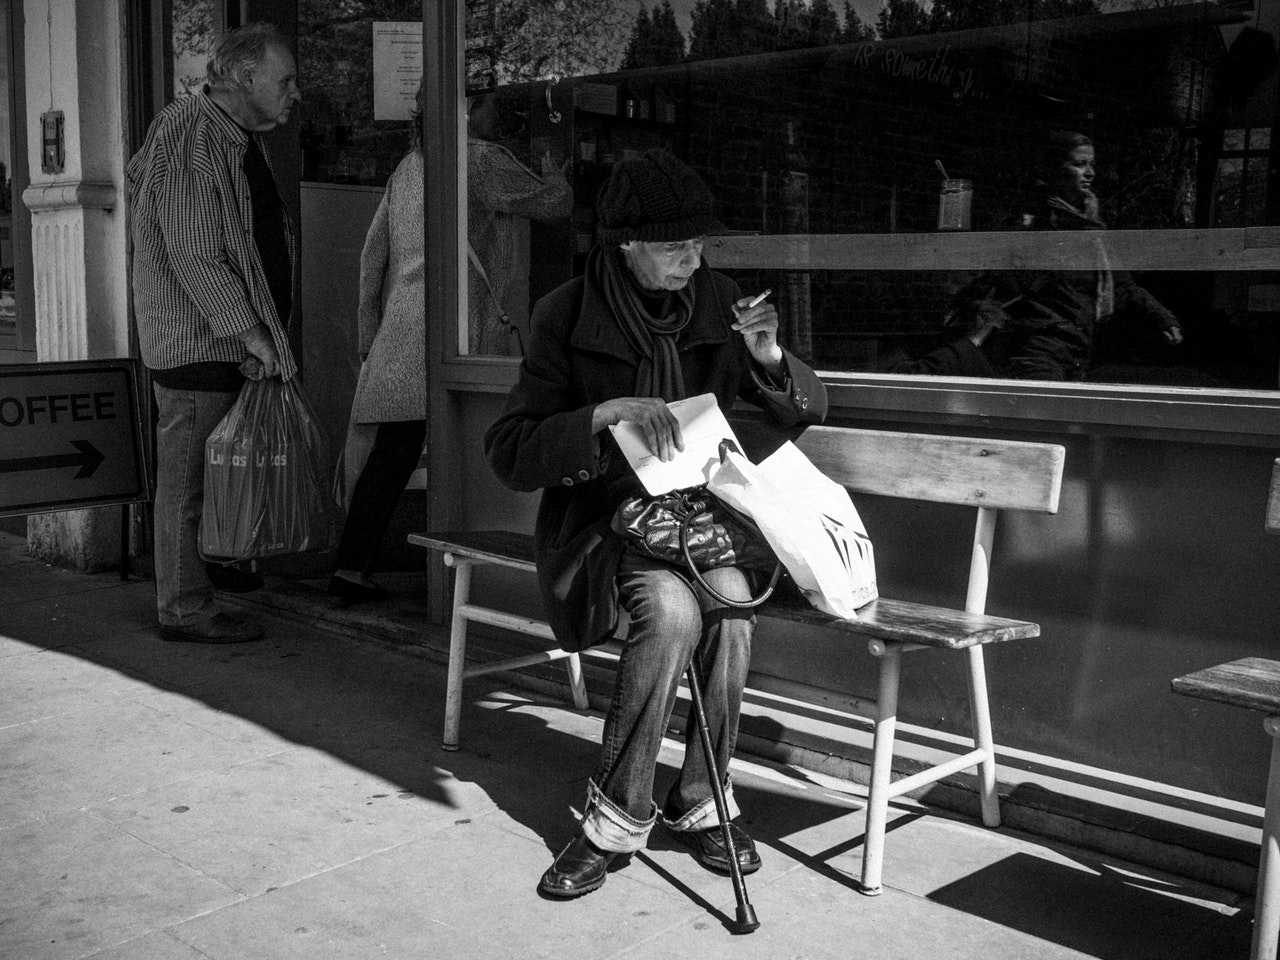 woman-smoking-cigarette-small